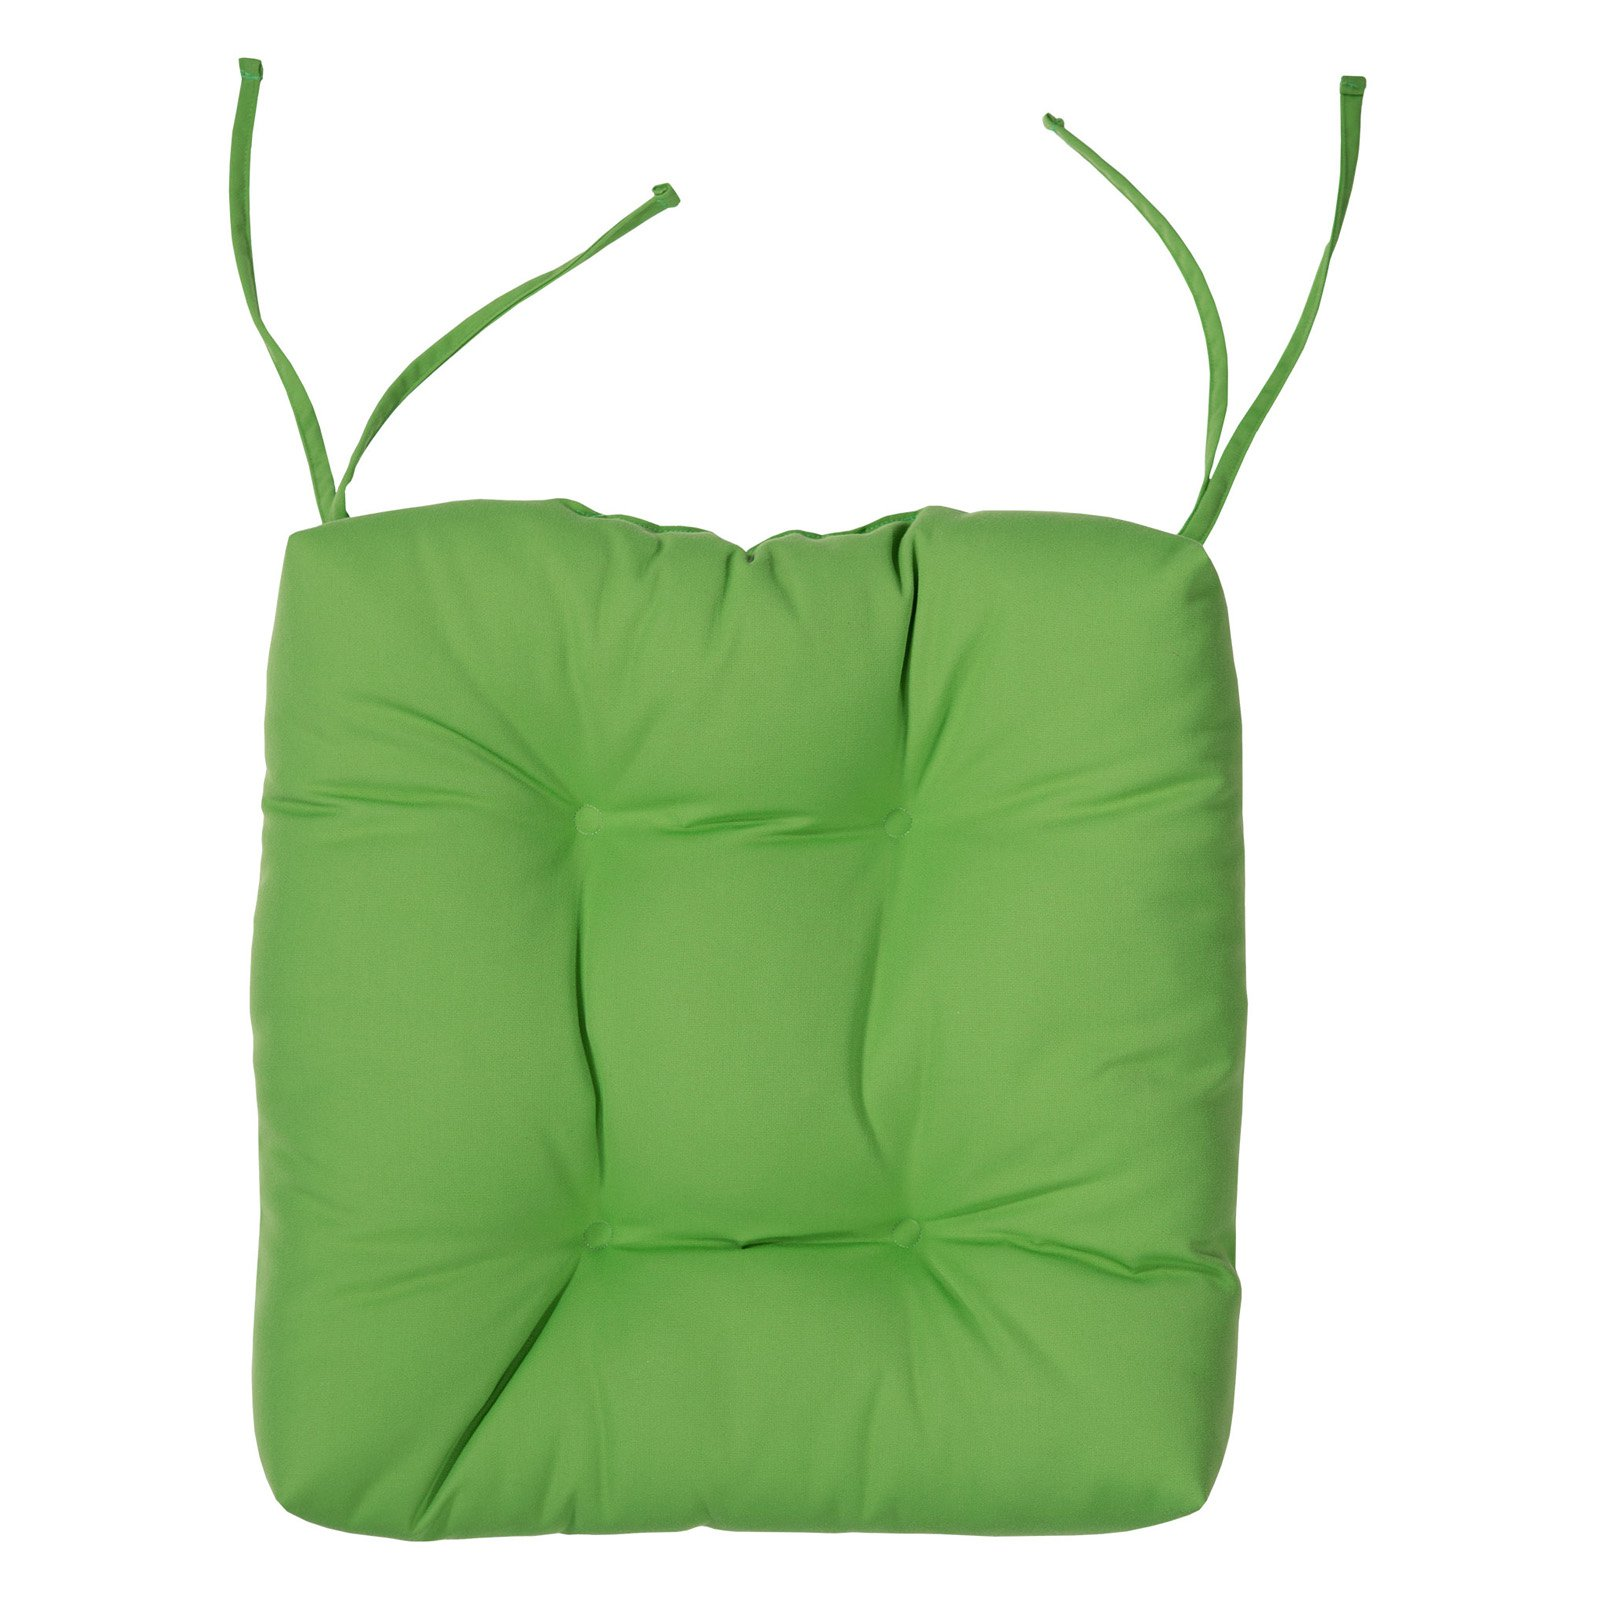 Thomasville At Home Sunbrella Tufted Outdoor Chair Cushion